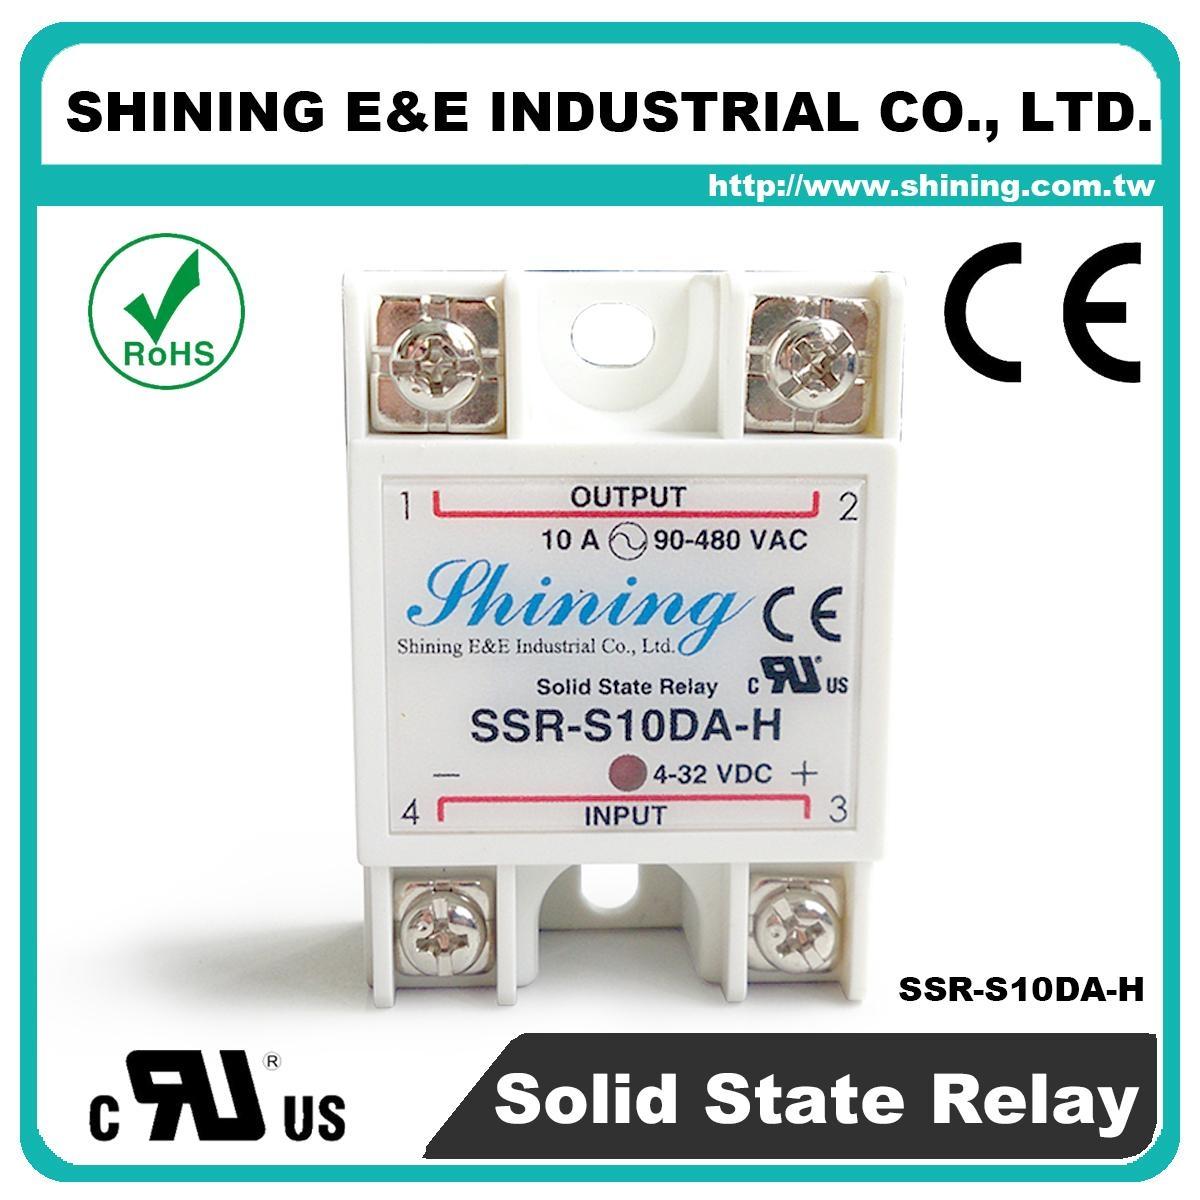 SSR-S10DA-H DC to AC 單相固態繼電器 Solid State Relay 1